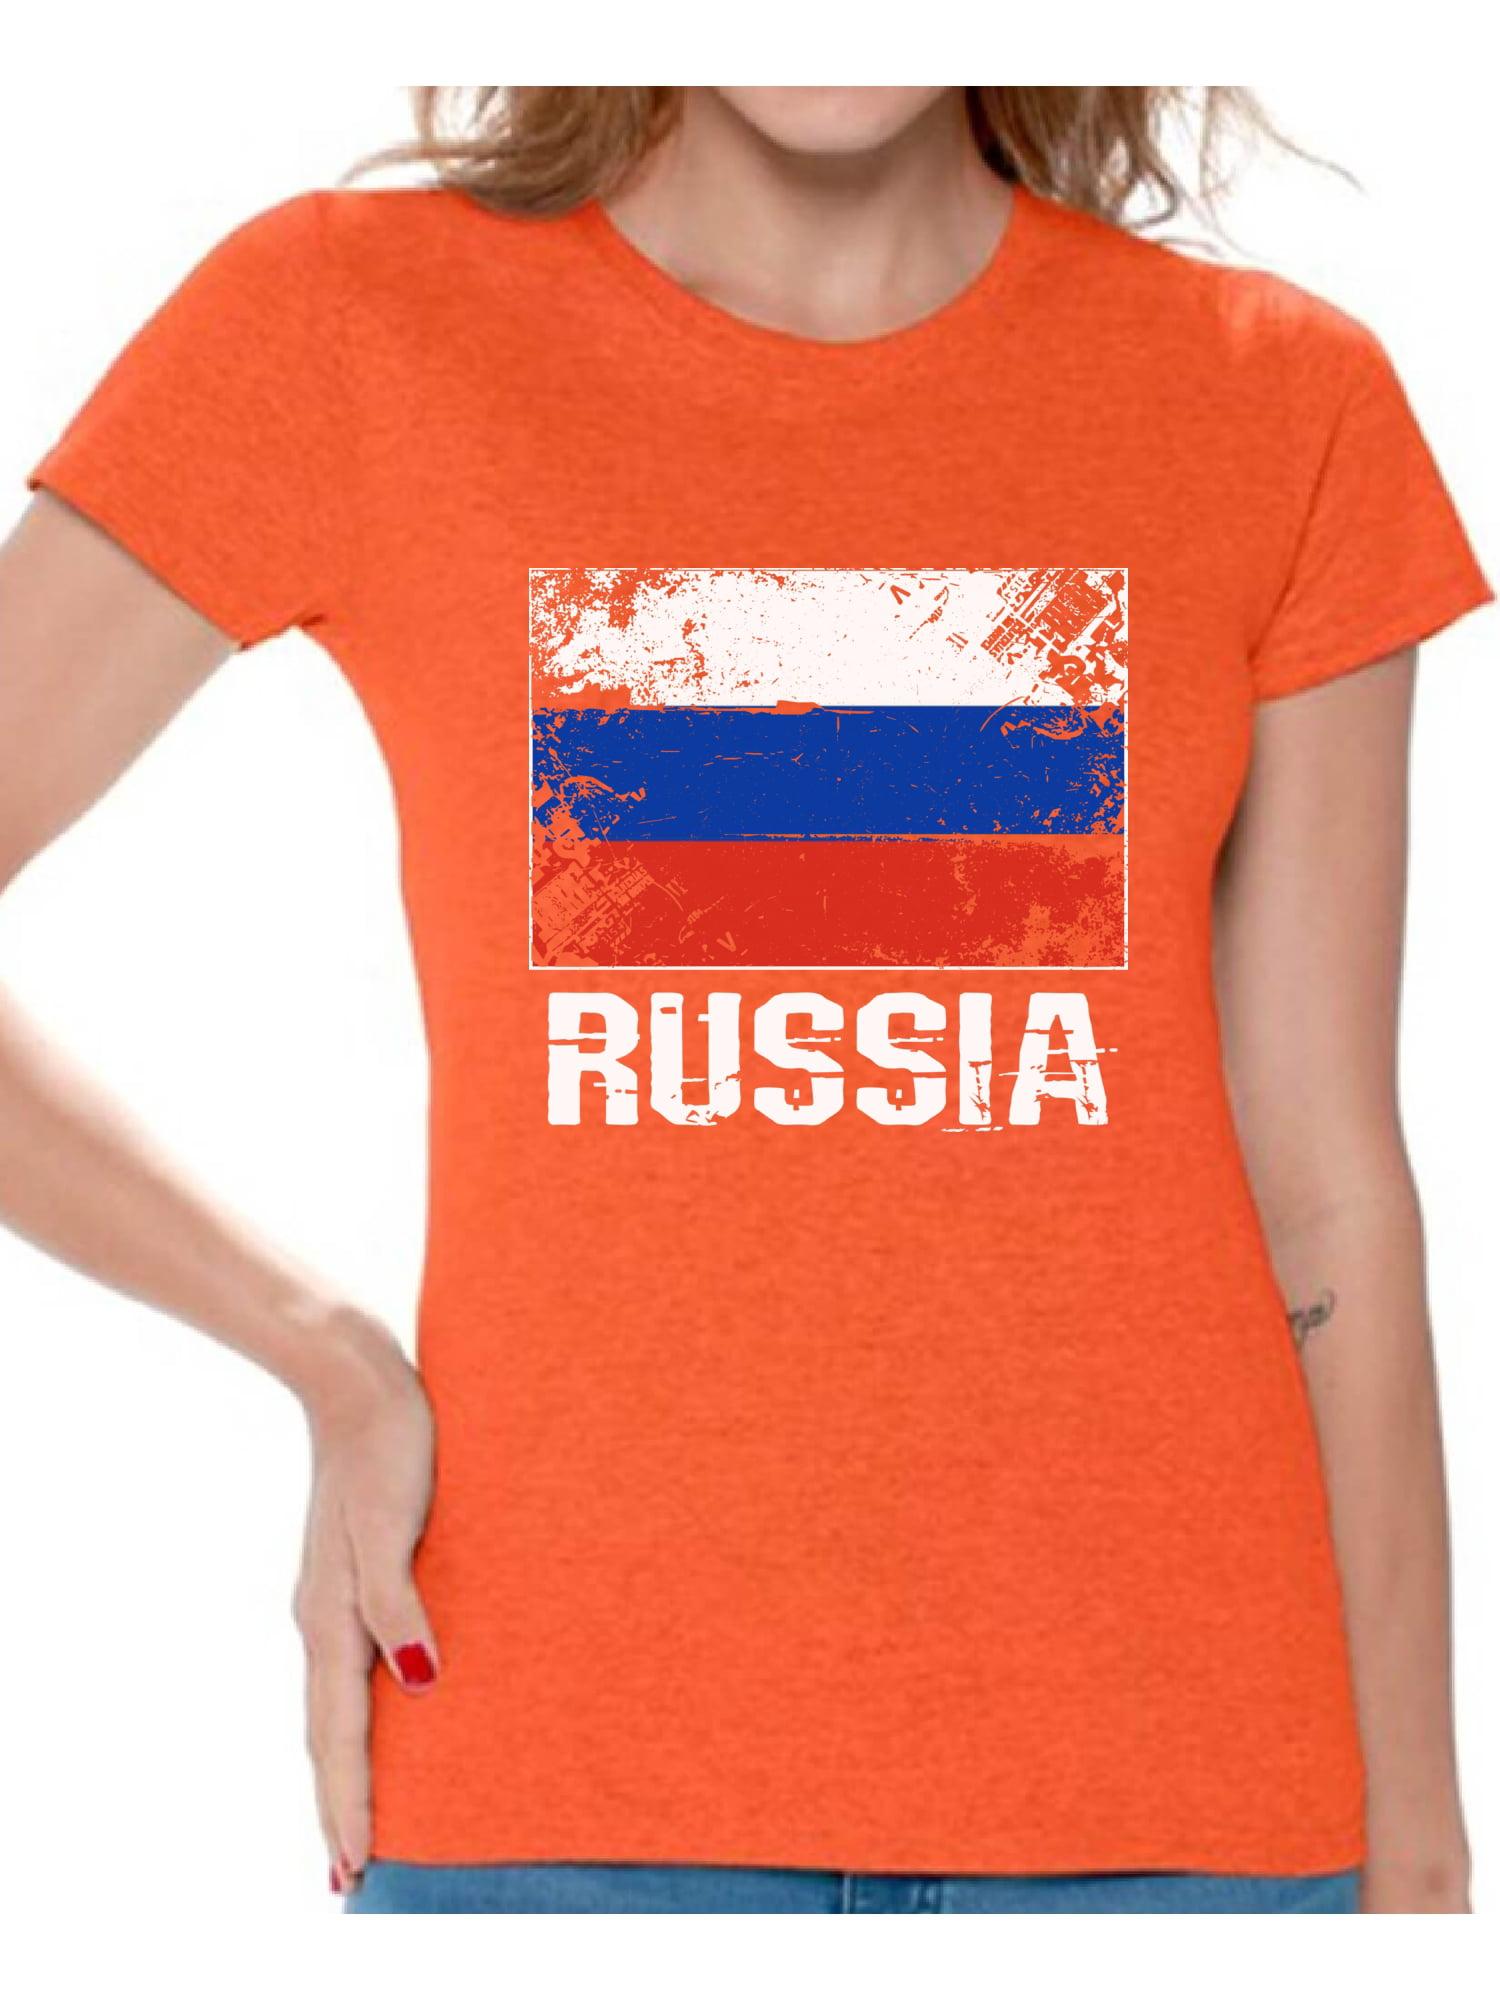 Russia Fun Themed Mens T-Shirt Novelty Russian I LOVE FOOTBALL Sport